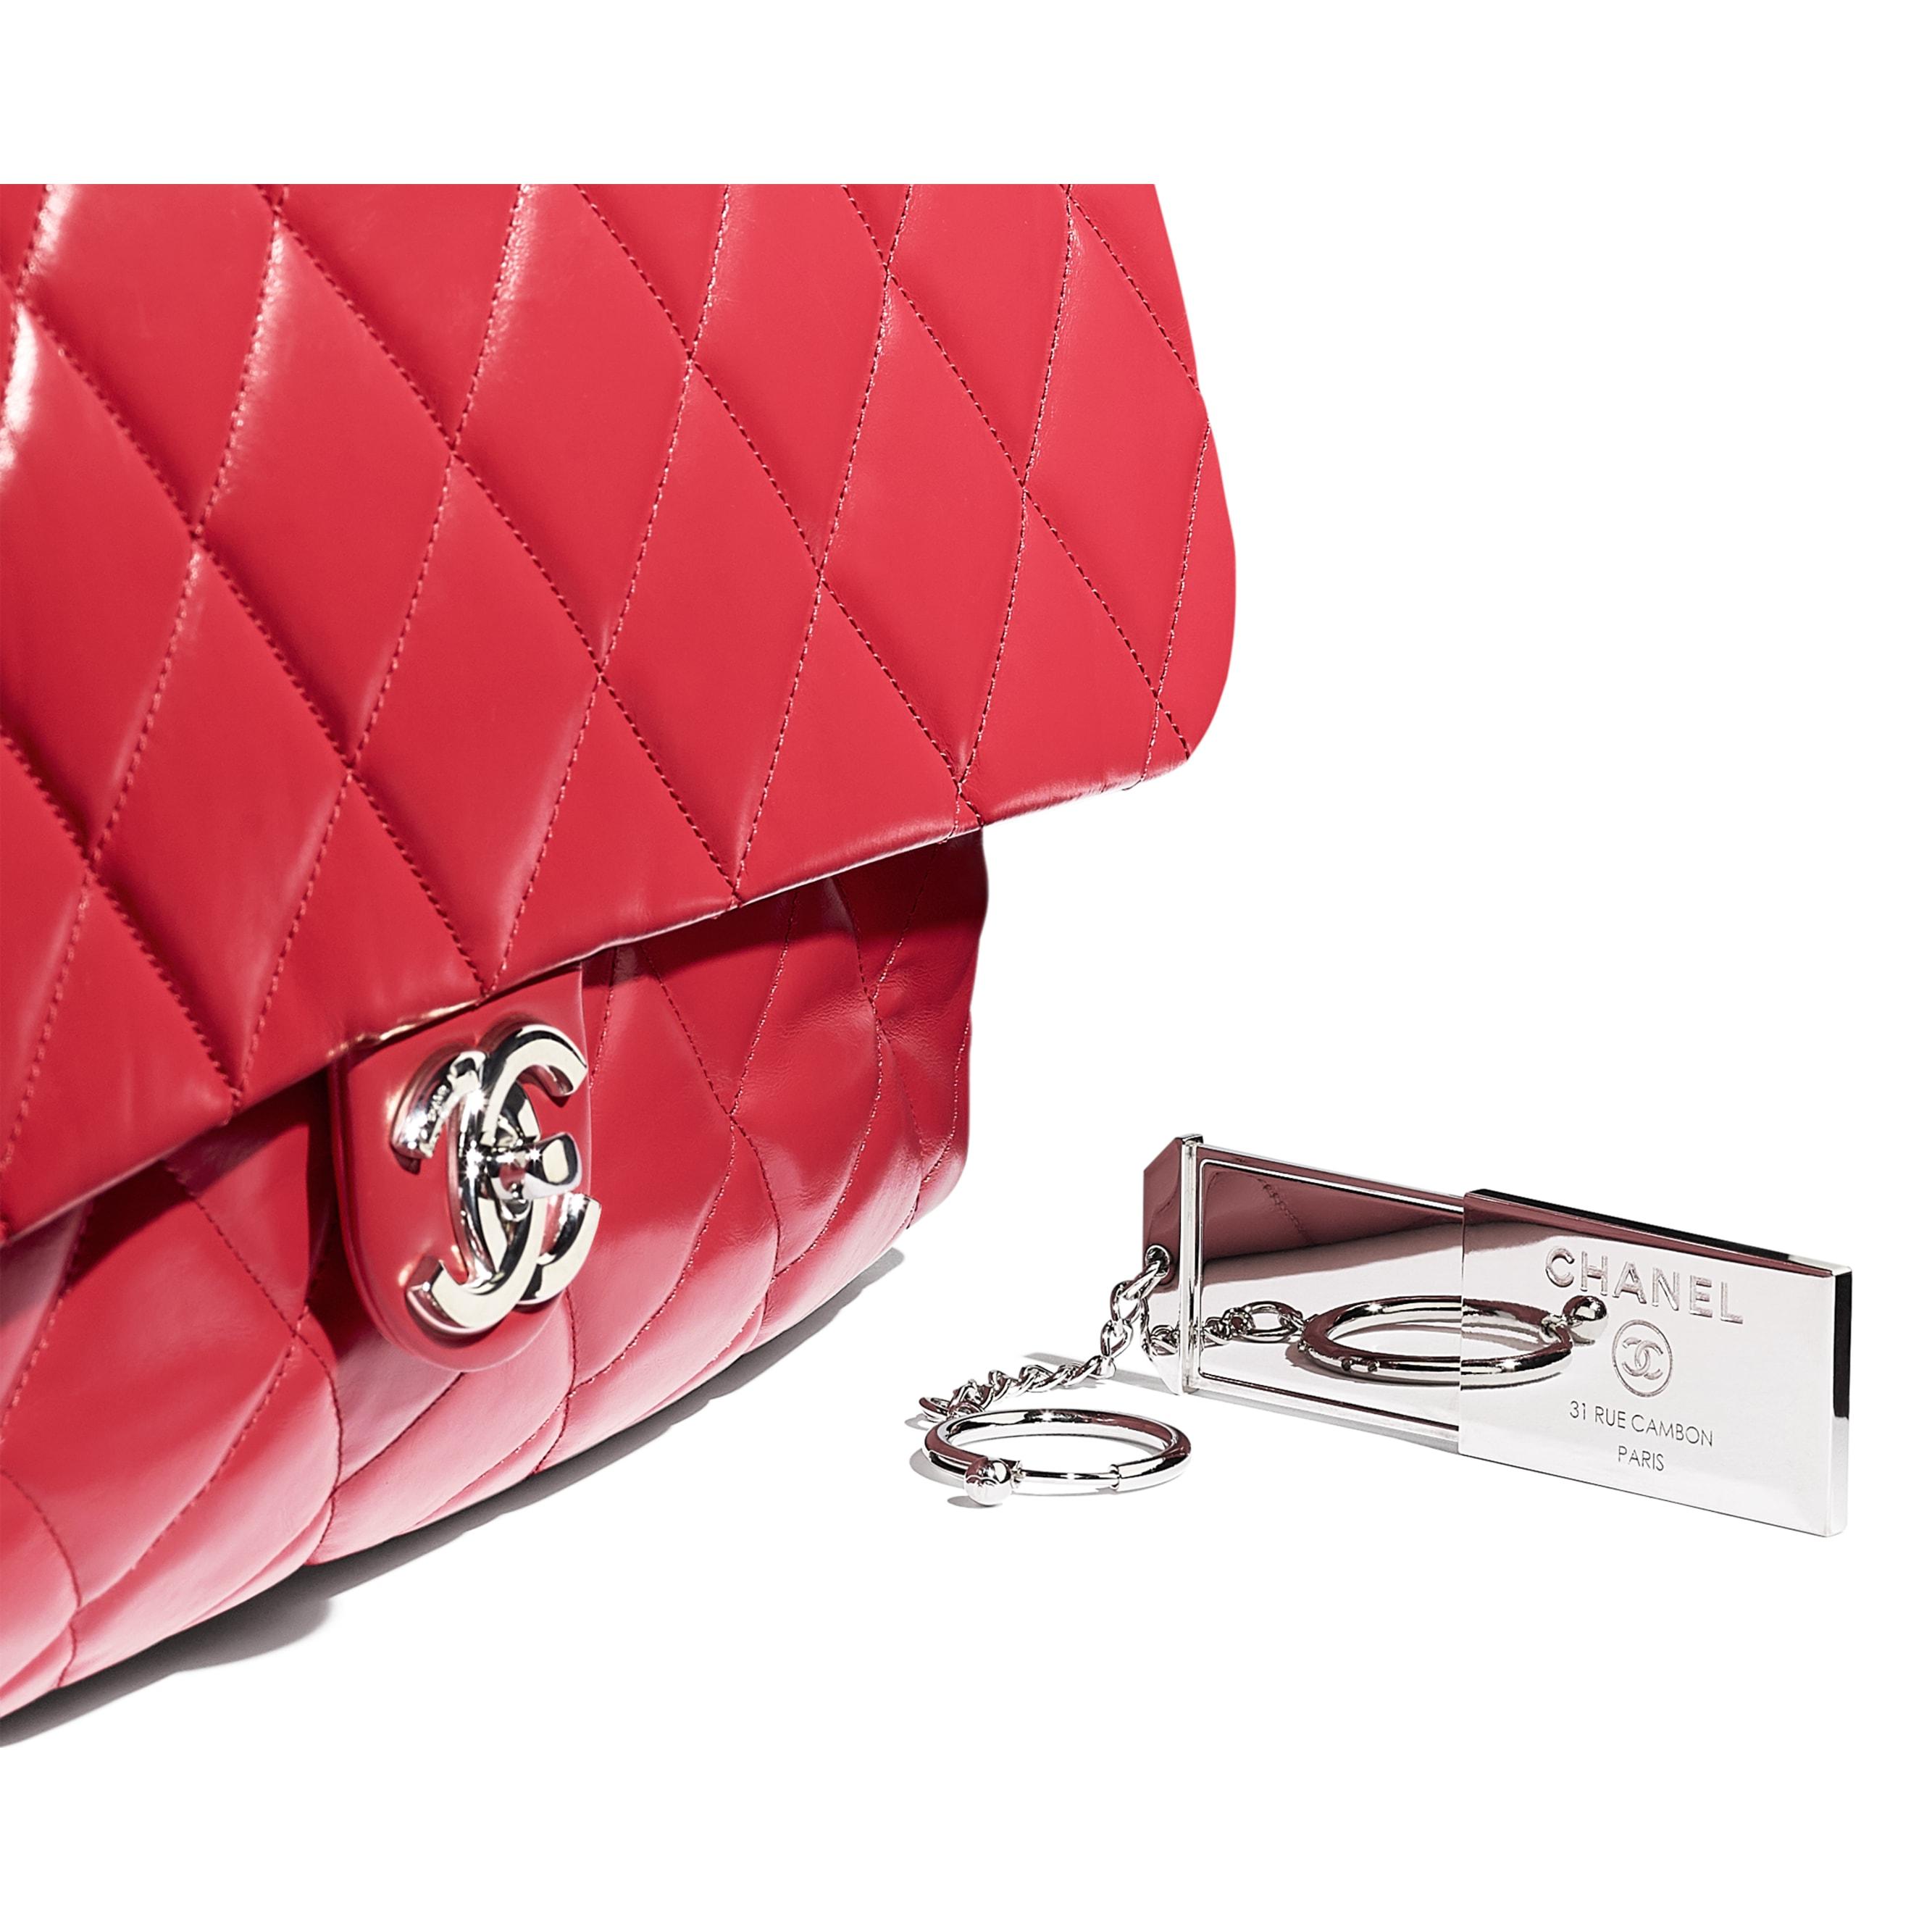 Große Bowling-Tasche - Rot - Kalbsleder & silberfarbenes Metall - Extra-Ansicht - Standardgröße anzeigen